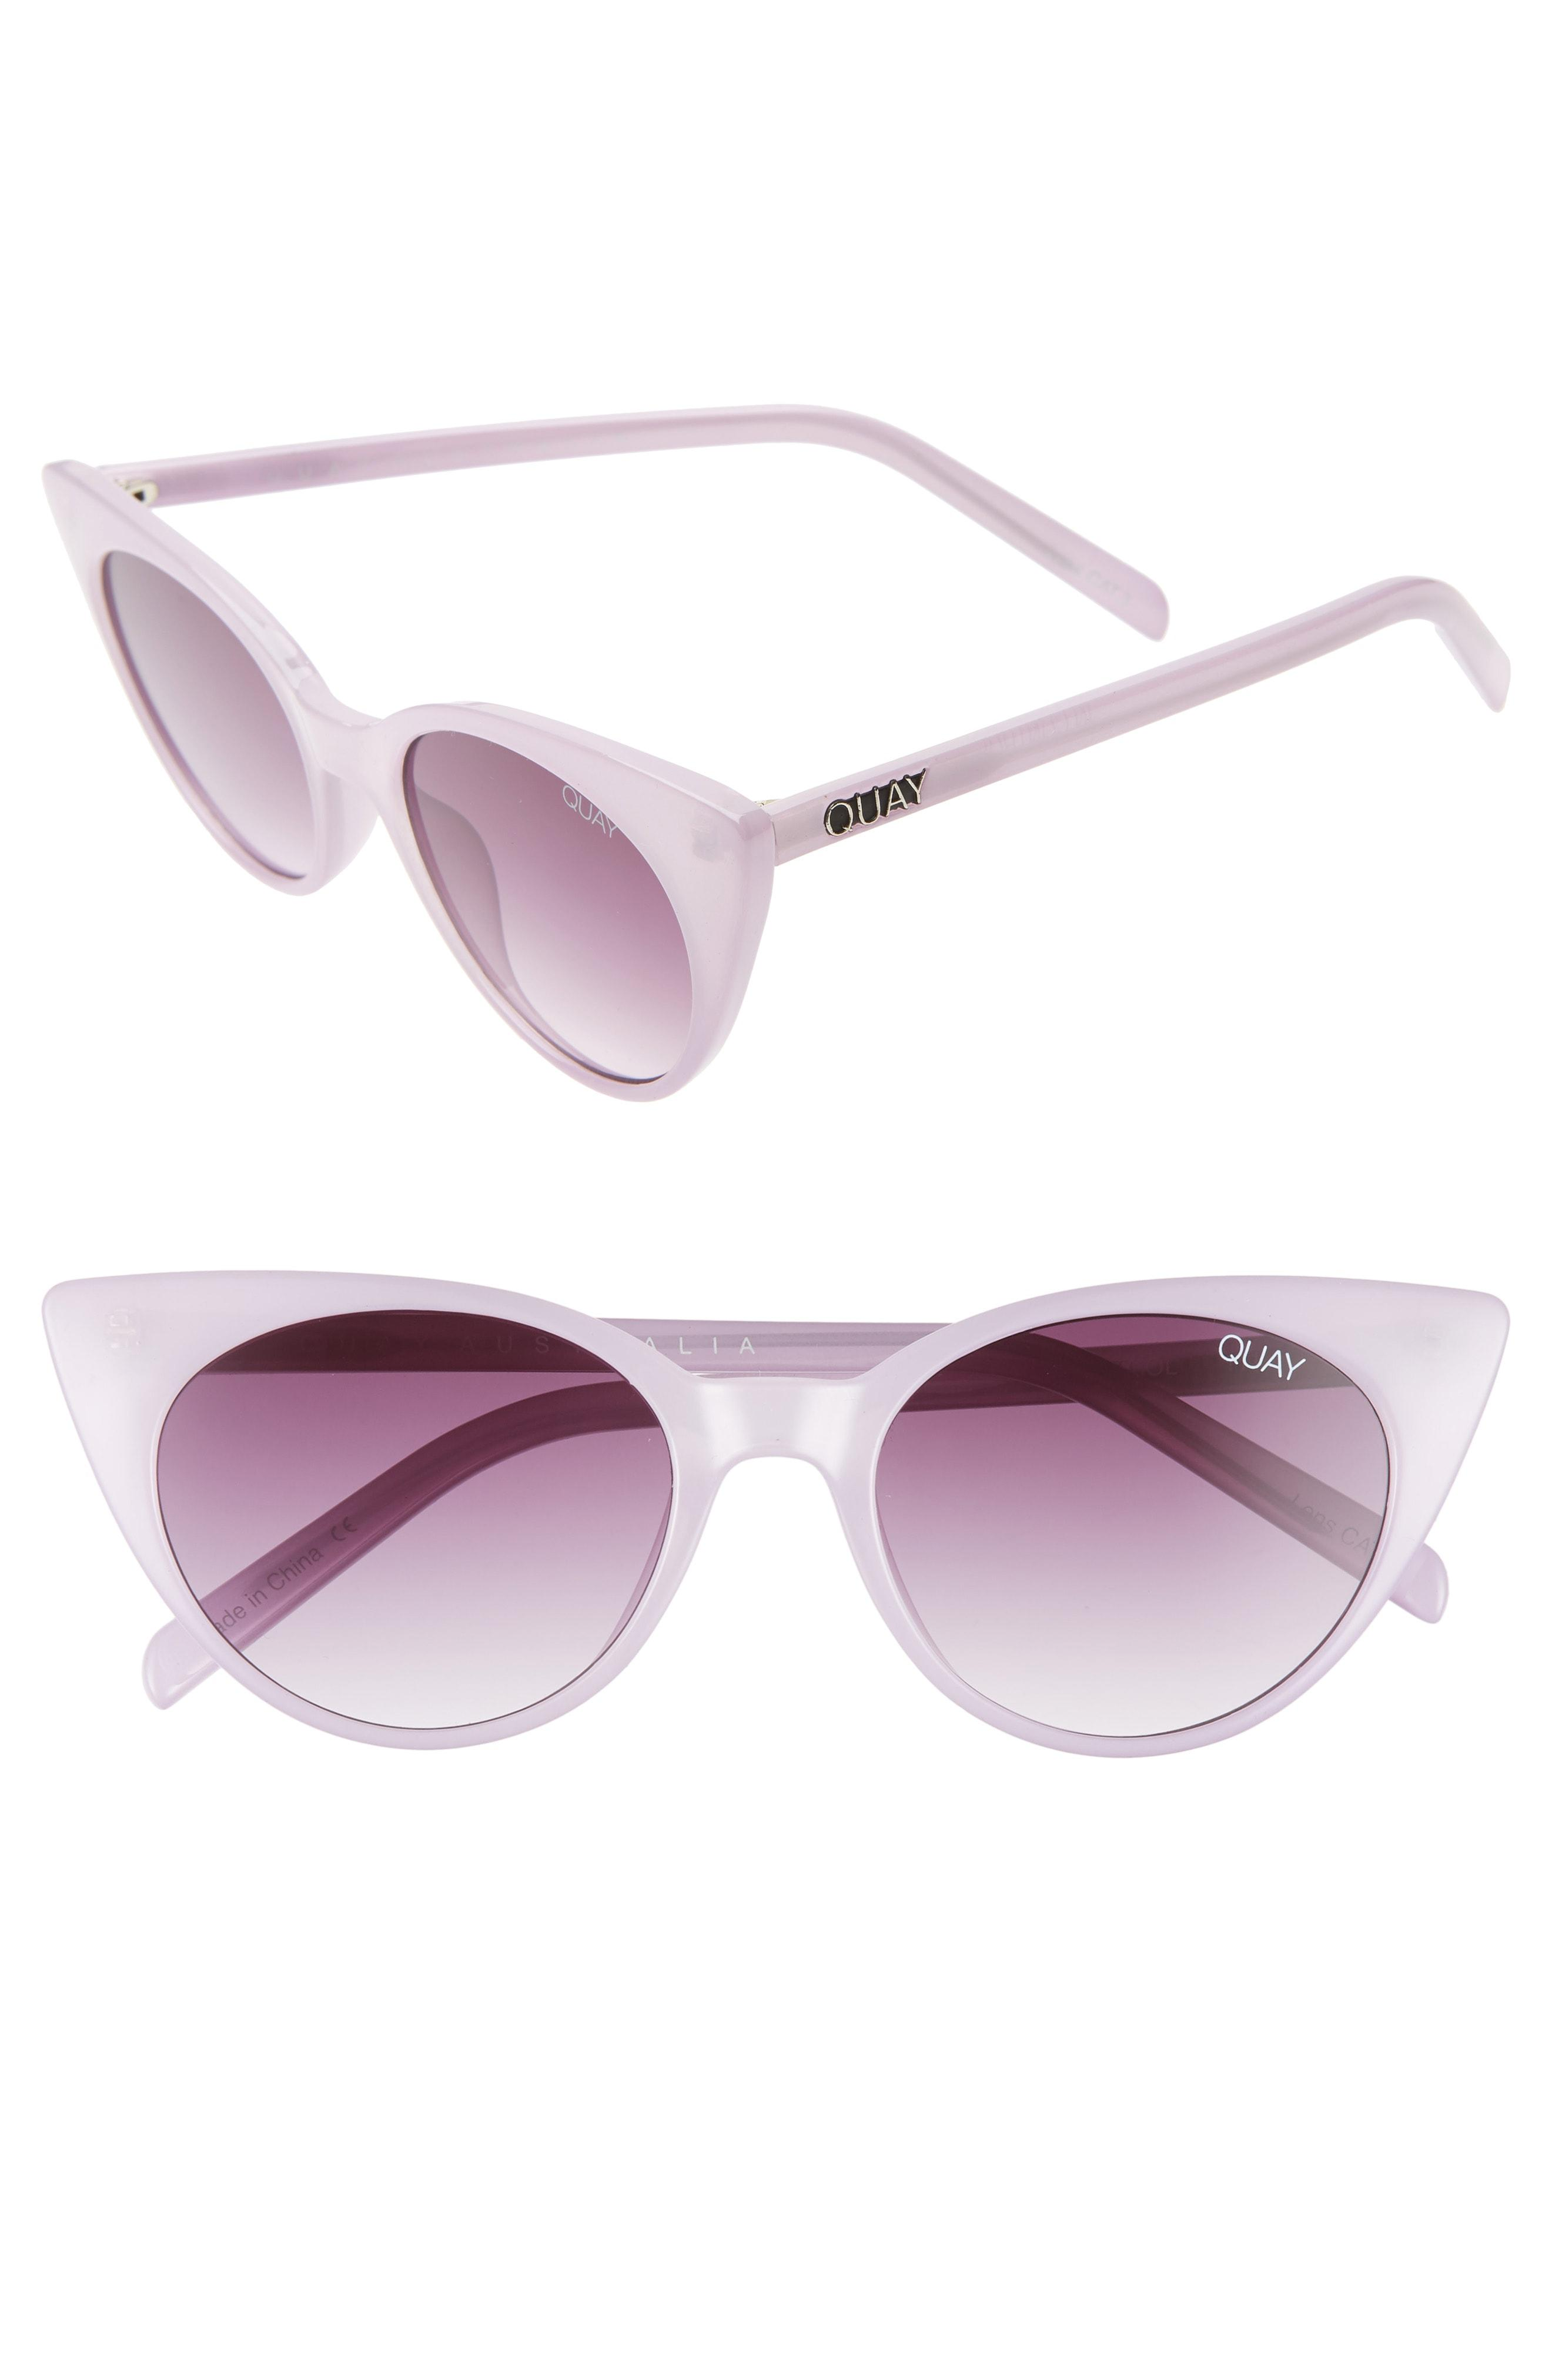 e08677fcca3a5 Quay - Multicolor Aphrodite 53mm Cat Eye Sunglasses - Violet  Purple Fade -  Lyst. View fullscreen